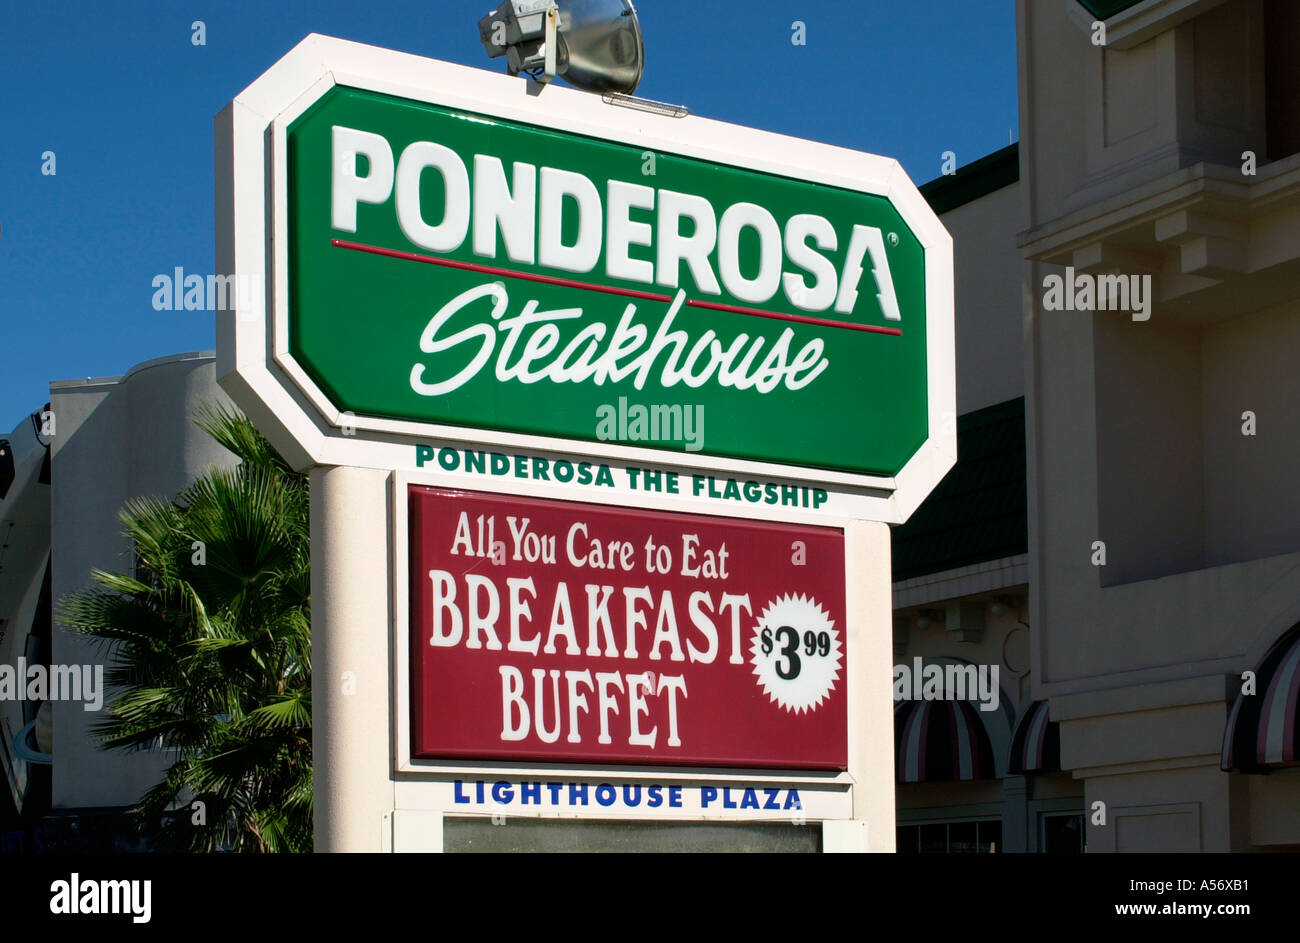 Ponderosa Steakhouse Restaurant Sign International Drive Orlando